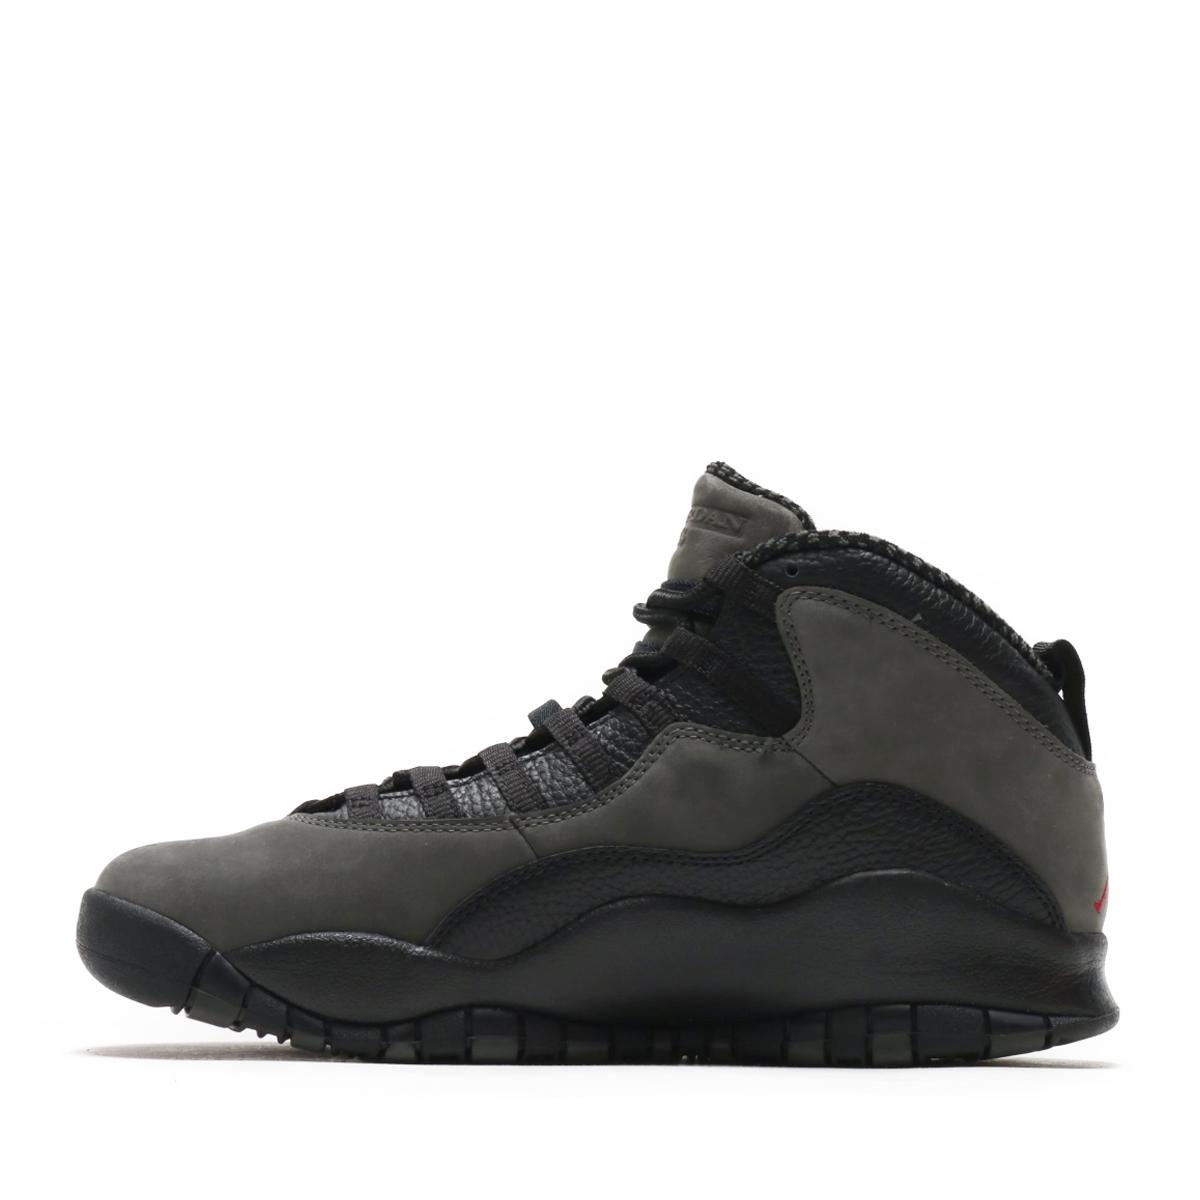 99184a322e65 NIKE AIR JORDAN 10 RETRO (nostalgic Nike Air Jordan 10) (DARK SHADOW TRUE  RED-BLACK) 18SU-S